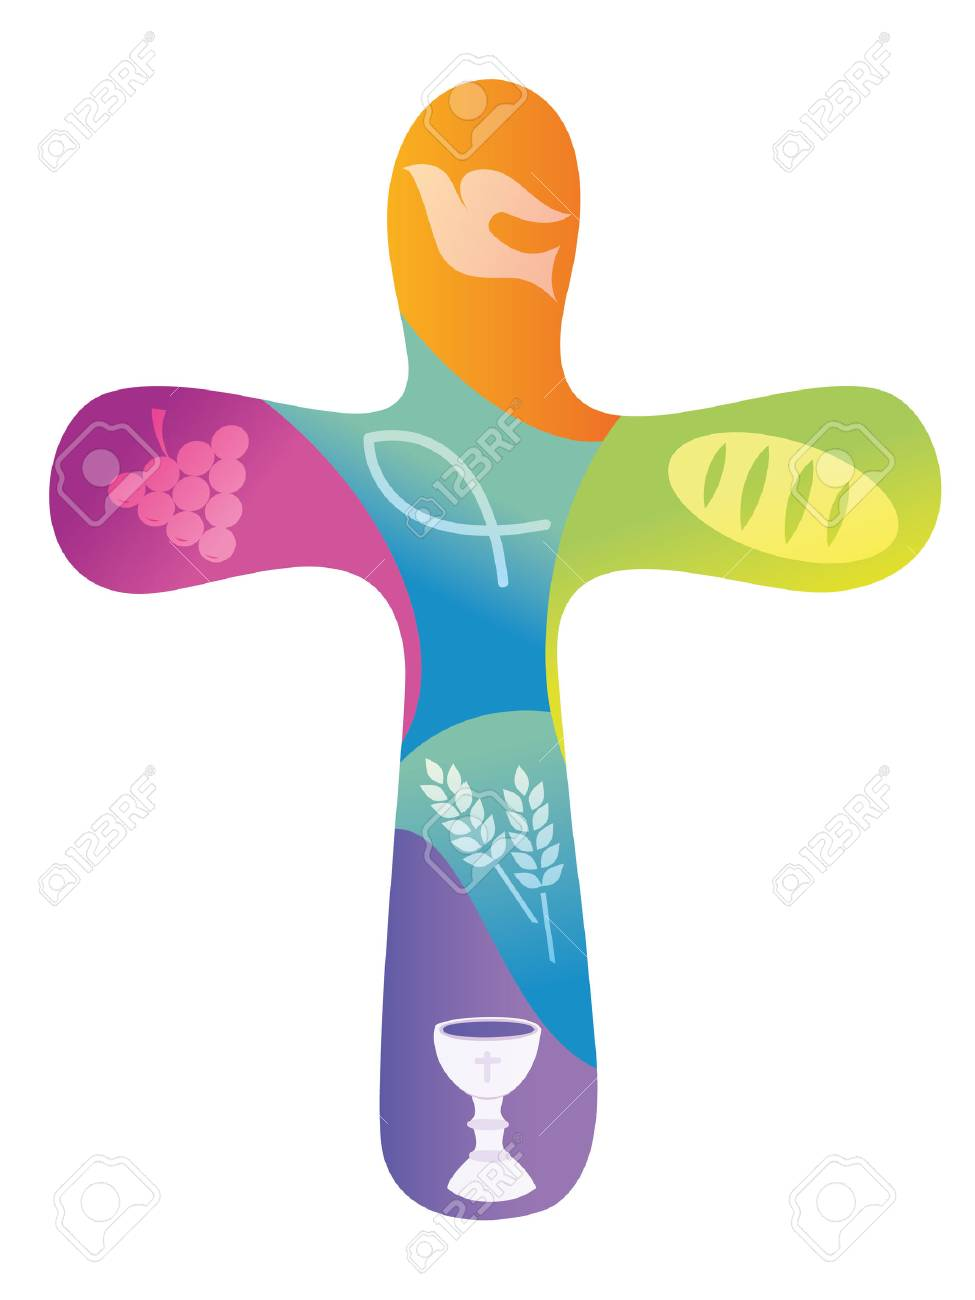 Rainbow christian cross with various symbols - 93018235